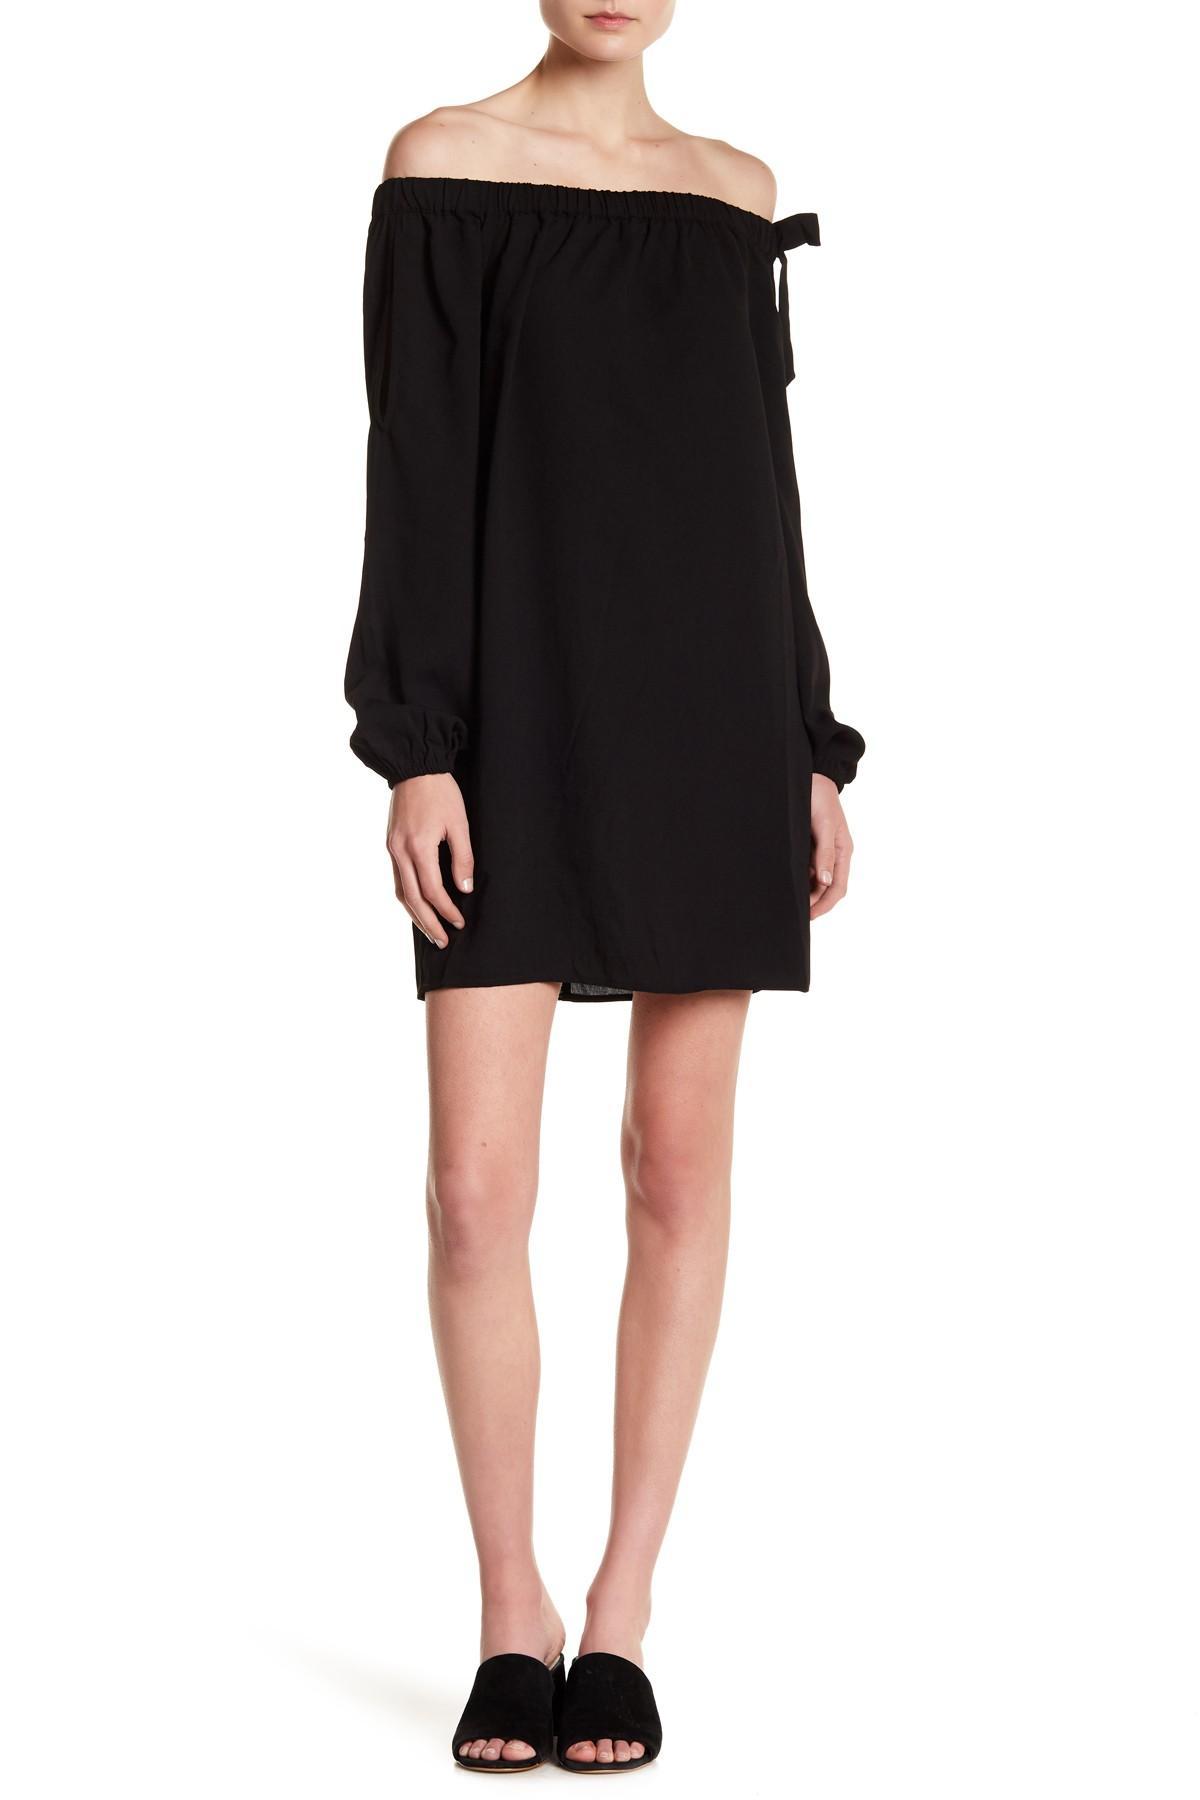 fcf765a4f722 Lyst - Ali   Jay Shift Dress in Black - Save 31%